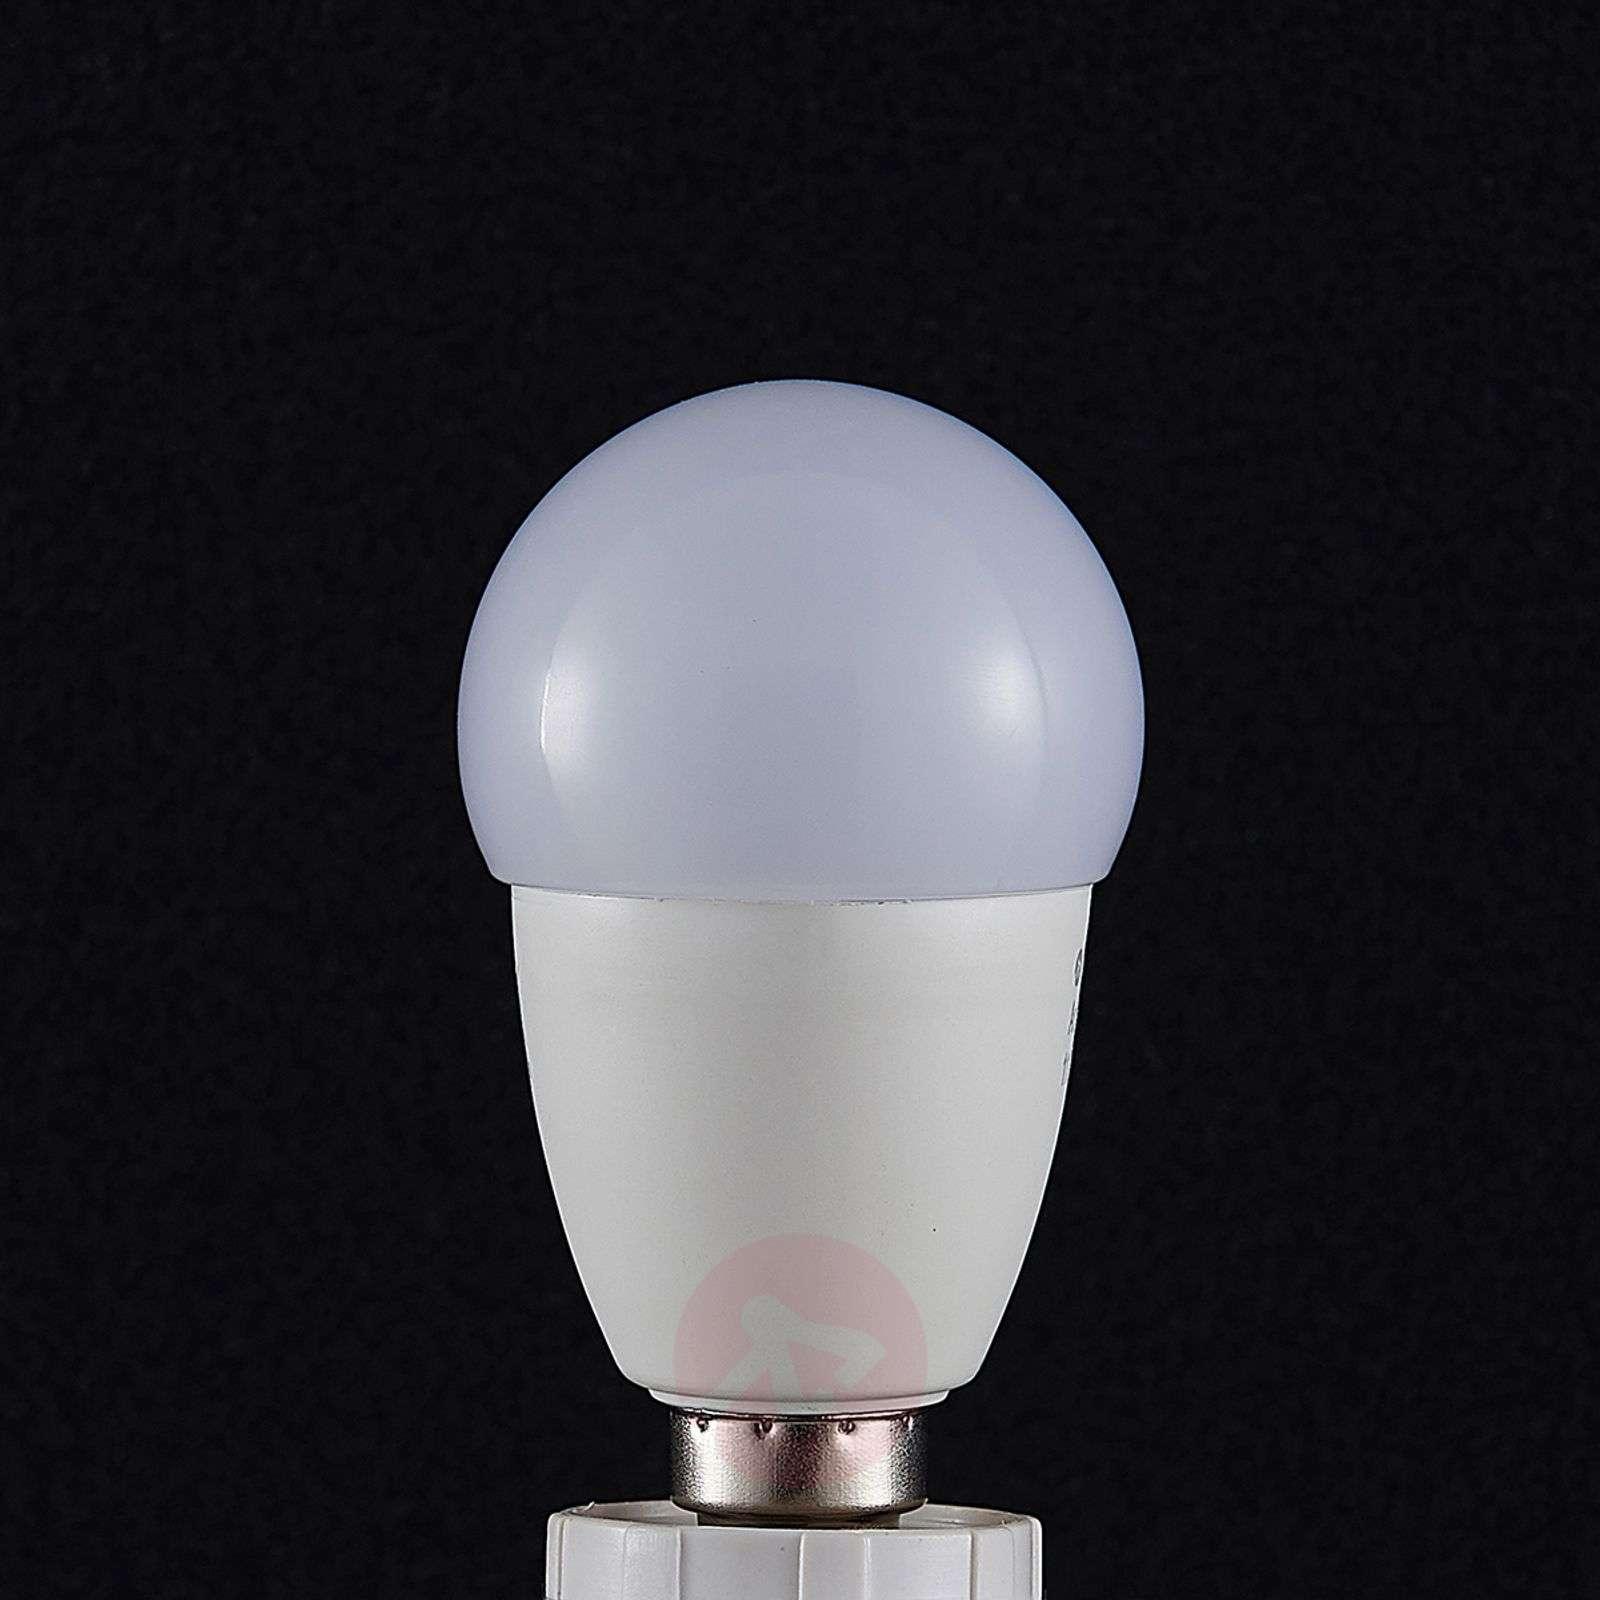 Lindby Smart LED-lamppu E14 4,5 W RGB pisara-9971020-01